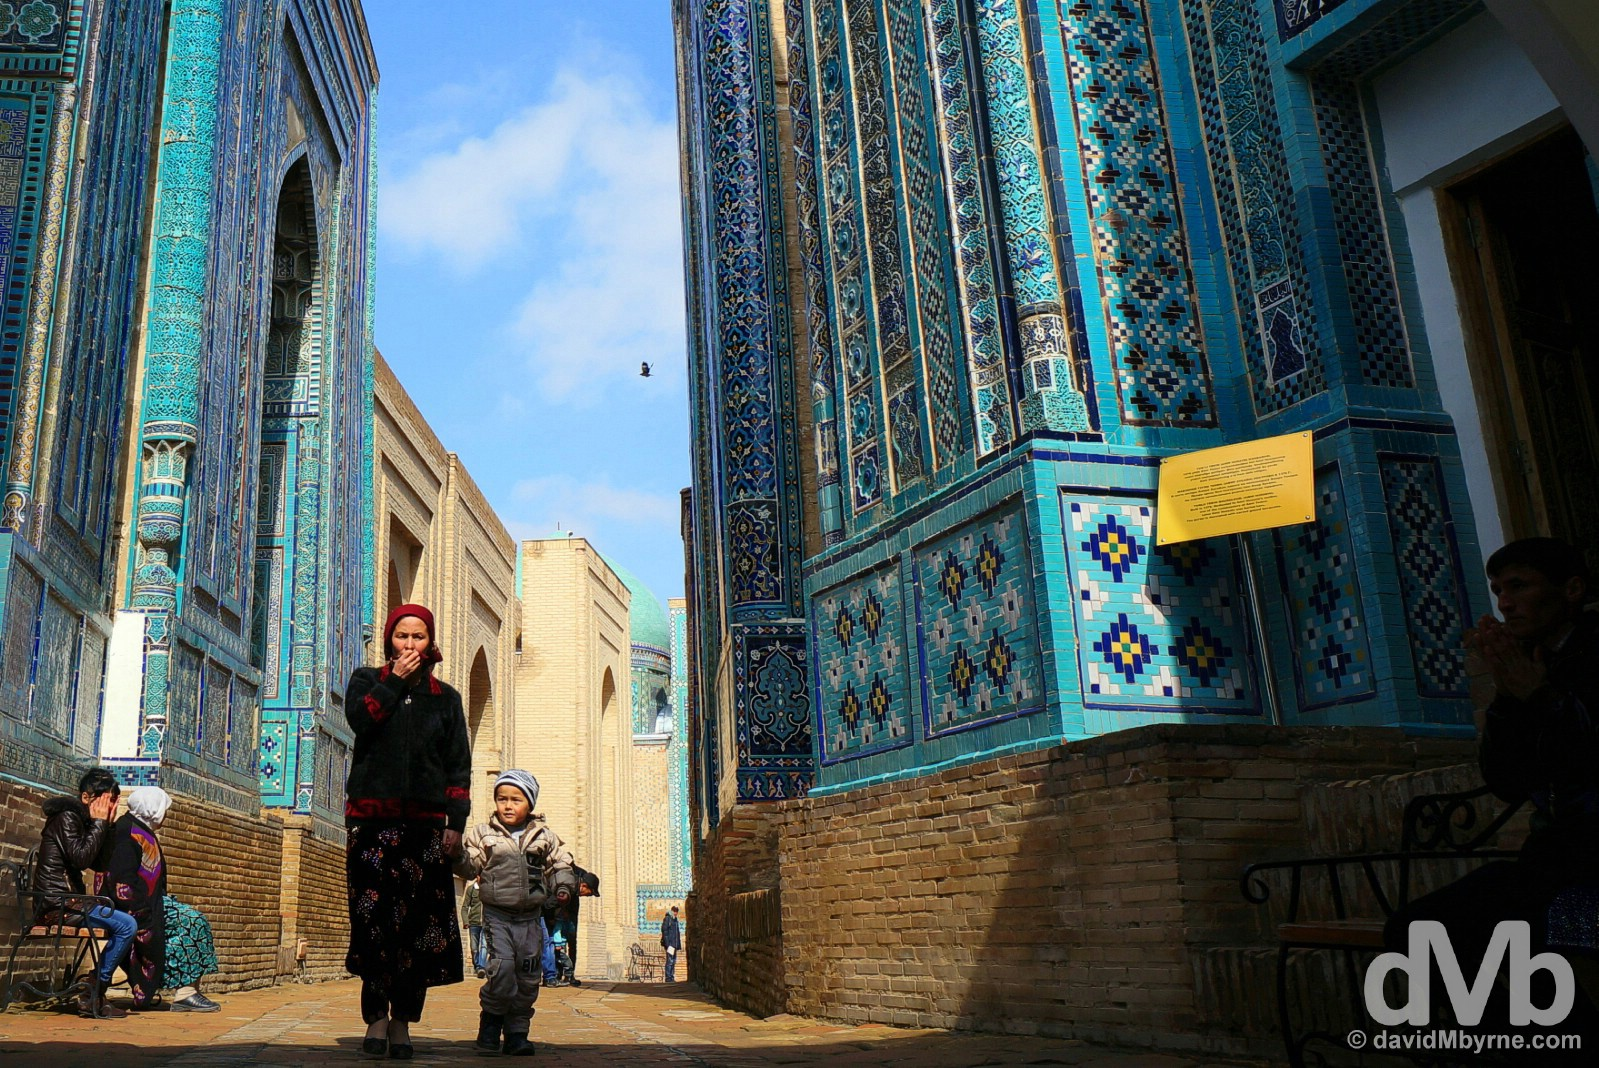 Walking through Shah-i-Zinda, the Avenue of Mausoleums, in Samarkand, Uzbekistan. March 8, 2015.